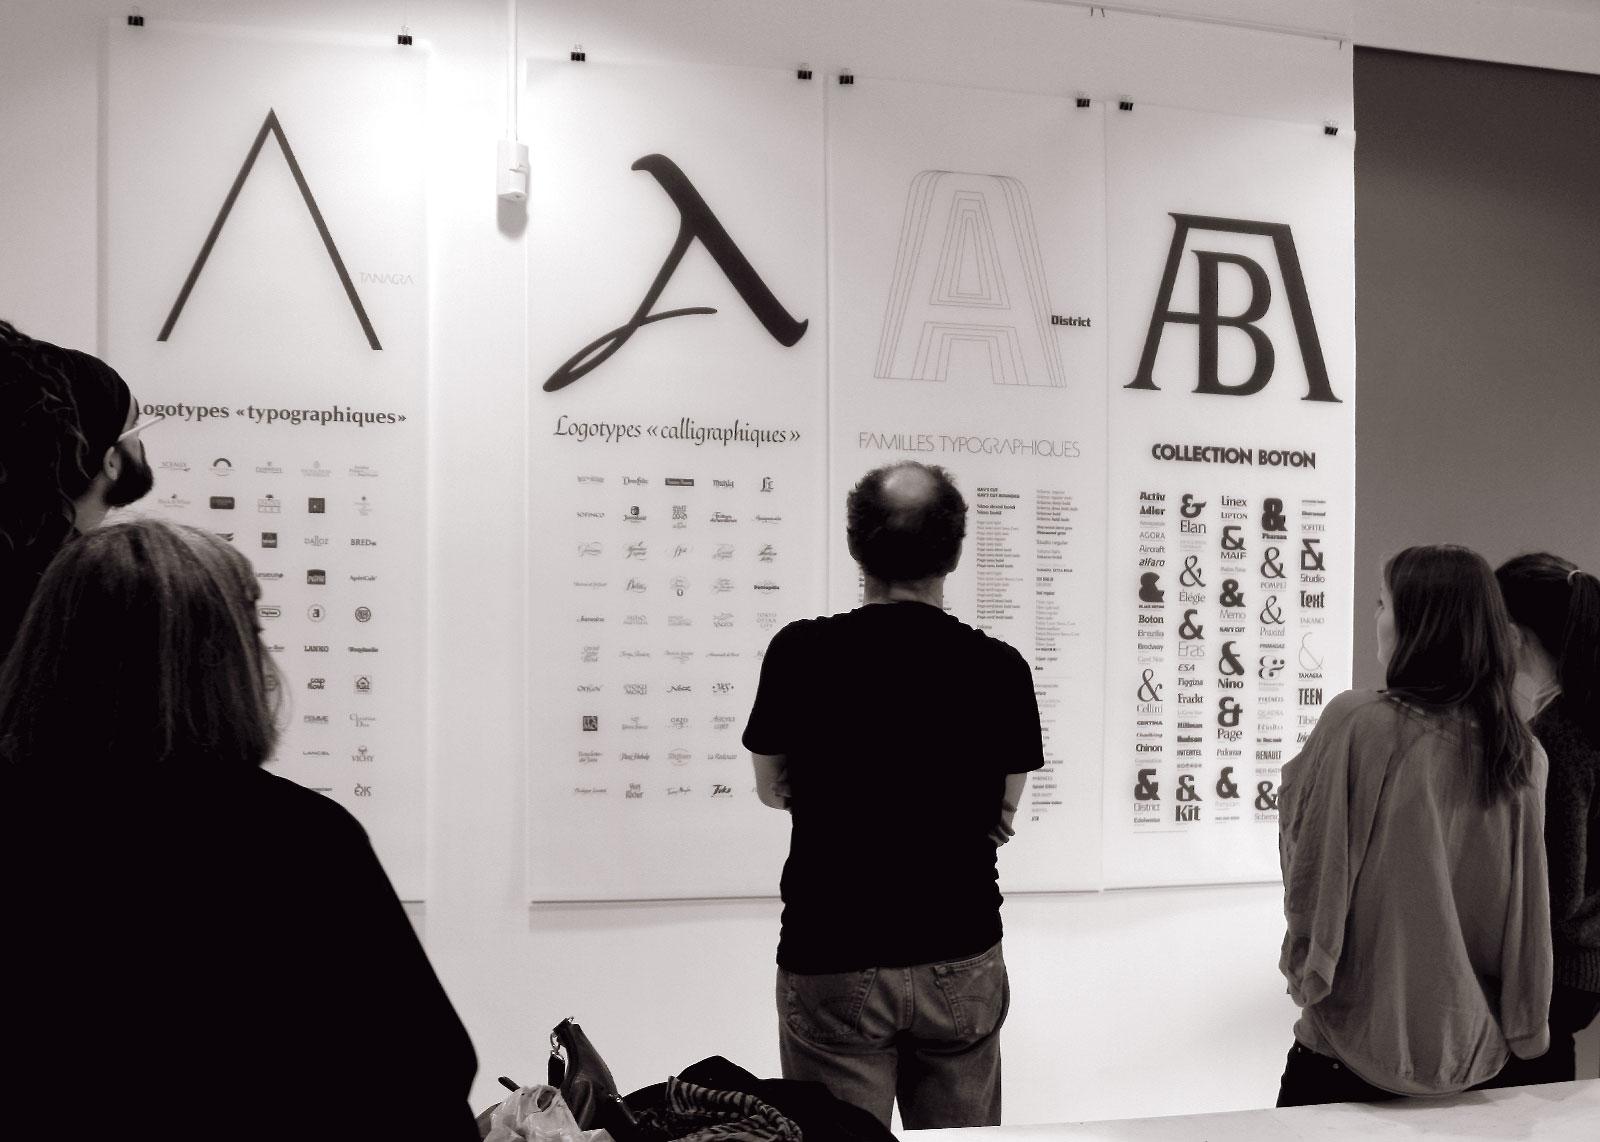 Accrochage, logotypes et familles de caractères, 26 novembre 2012 (photo Albert Boton).